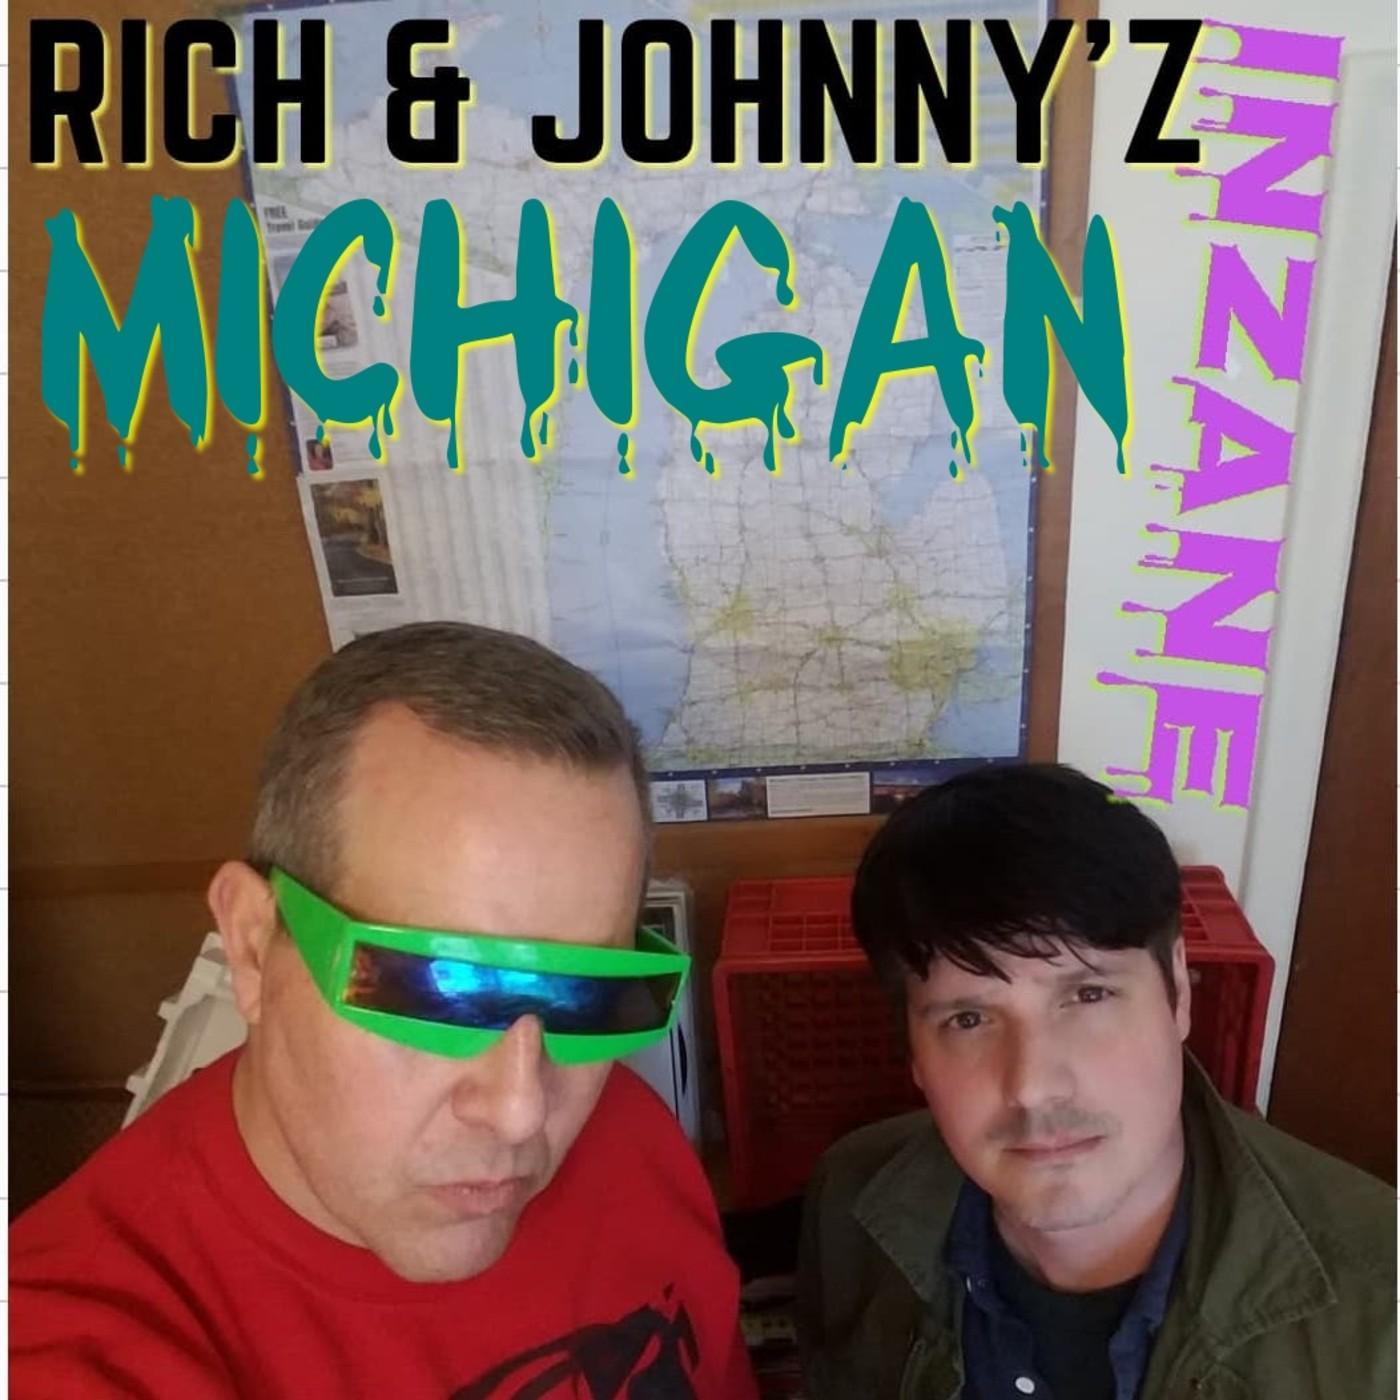 Rich and Johnny's Inzane Michigan show art